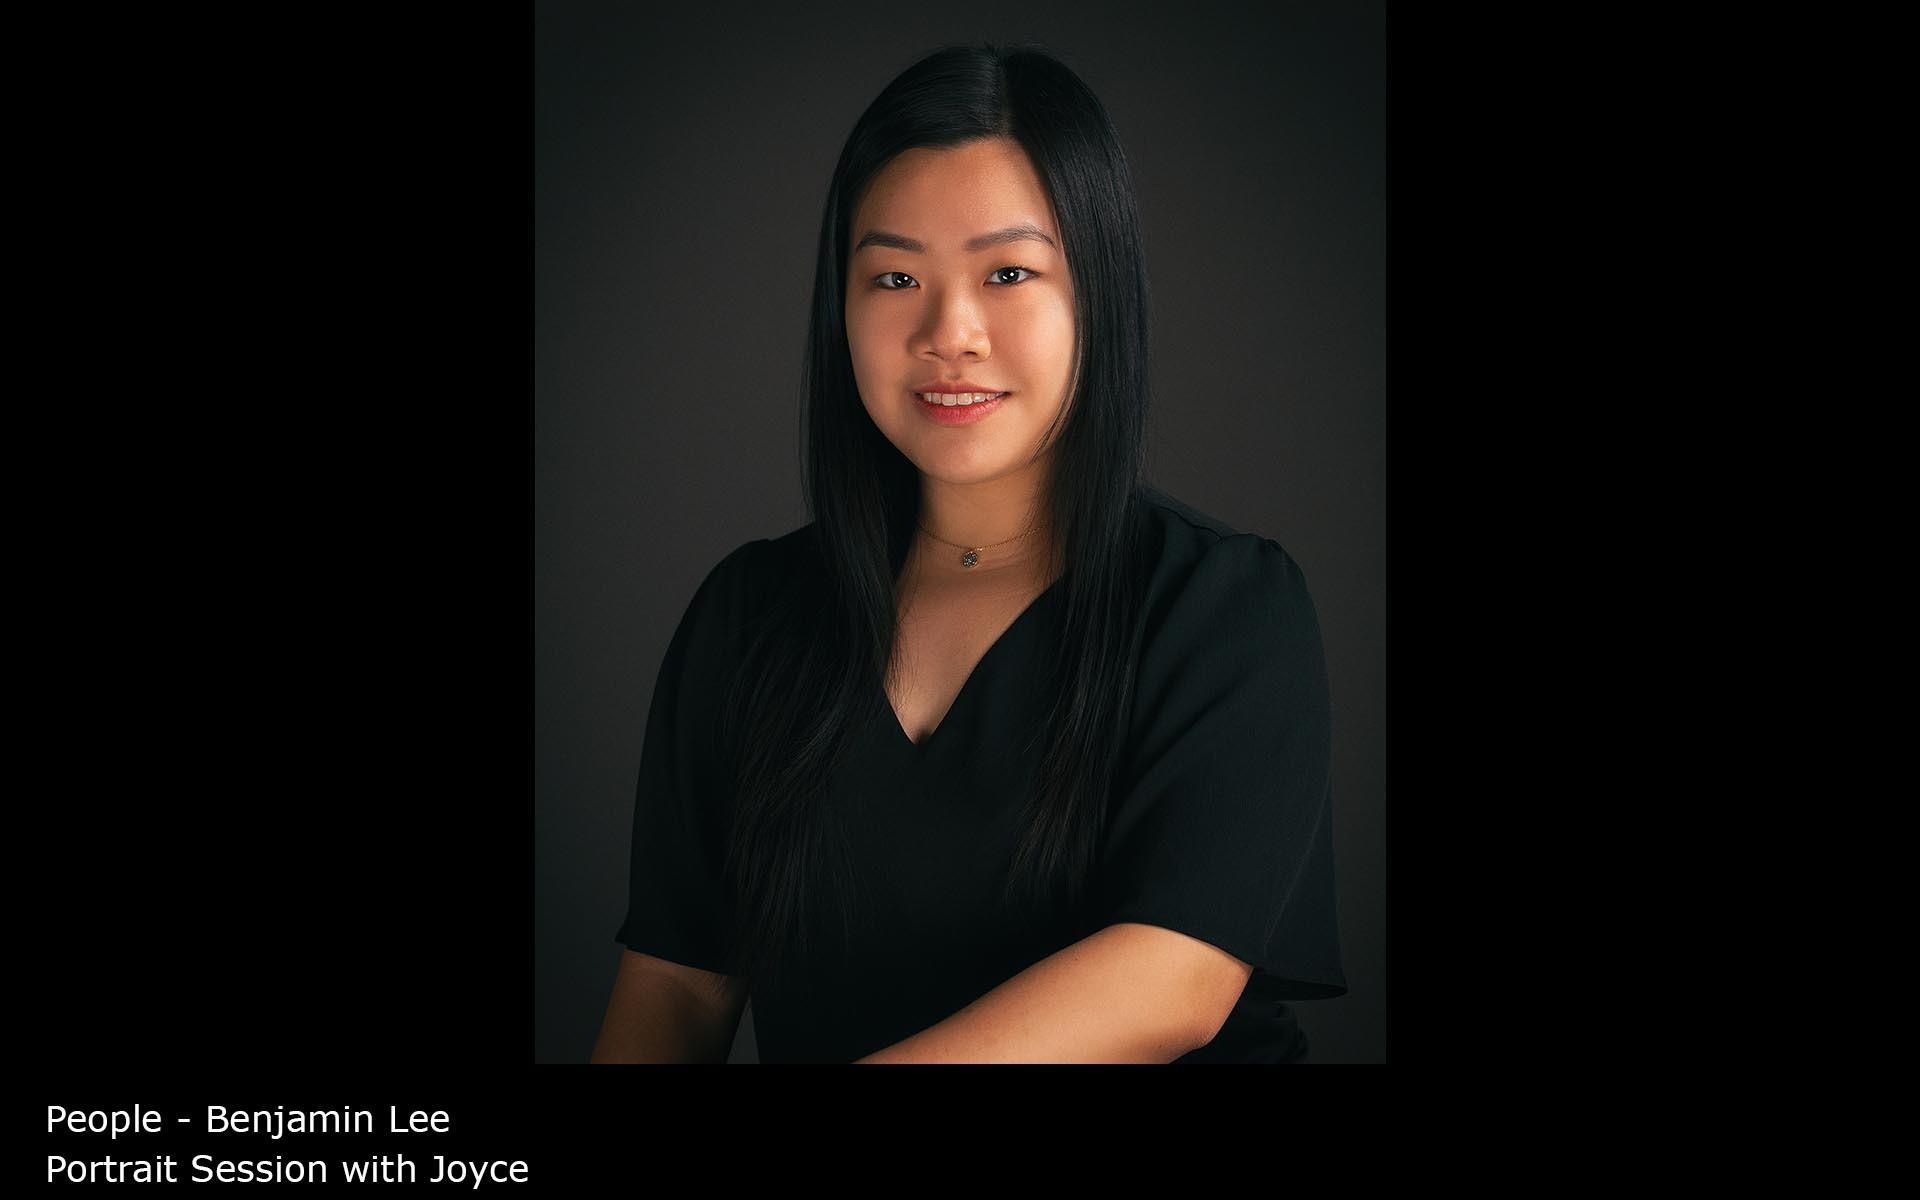 Portrait Session with Joyce - Benjamin Lee